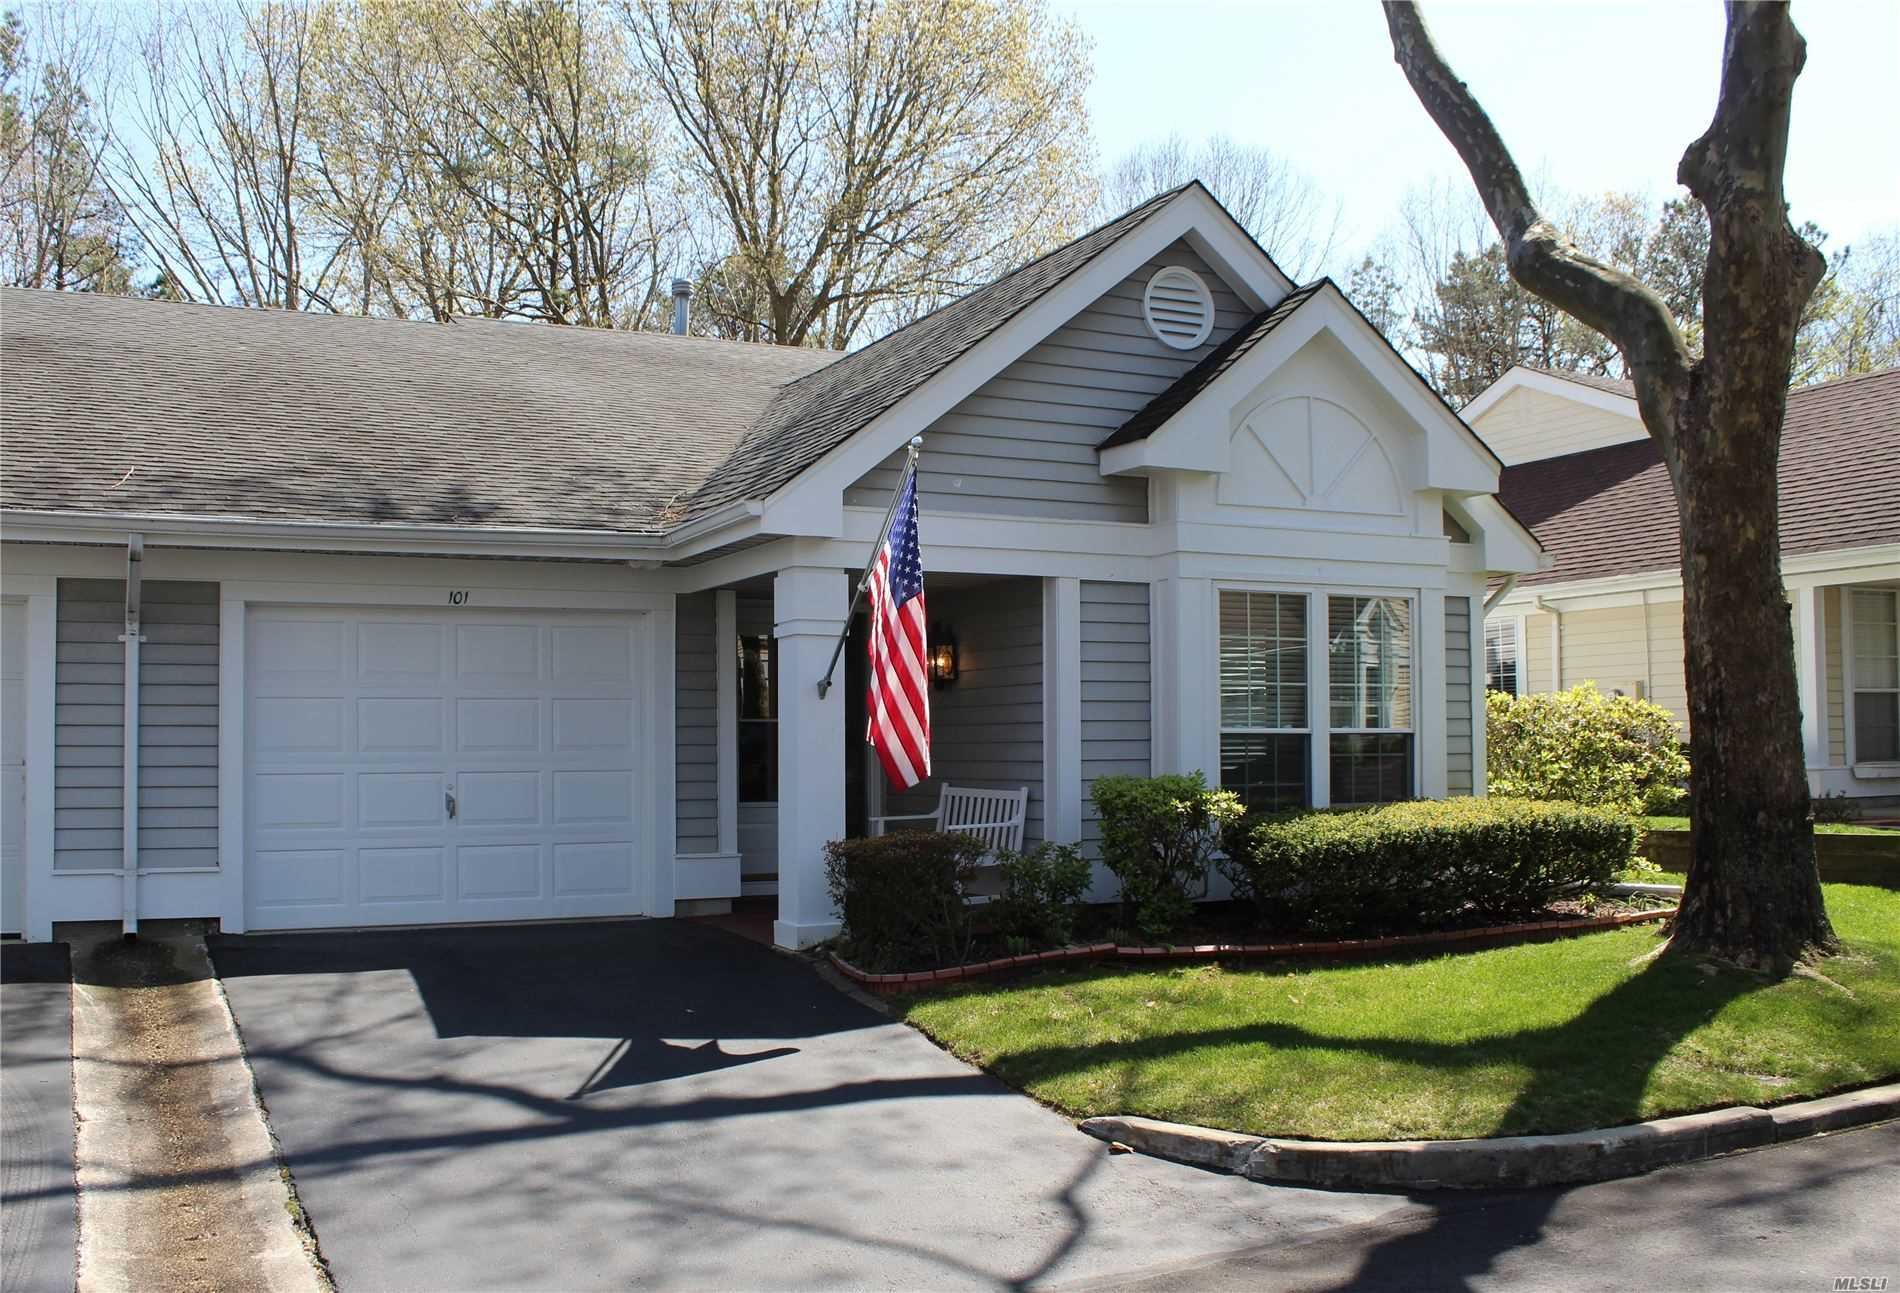 Property for sale at 101 Glen Drive, Ridge NY 11961, Ridge,  New York 11961